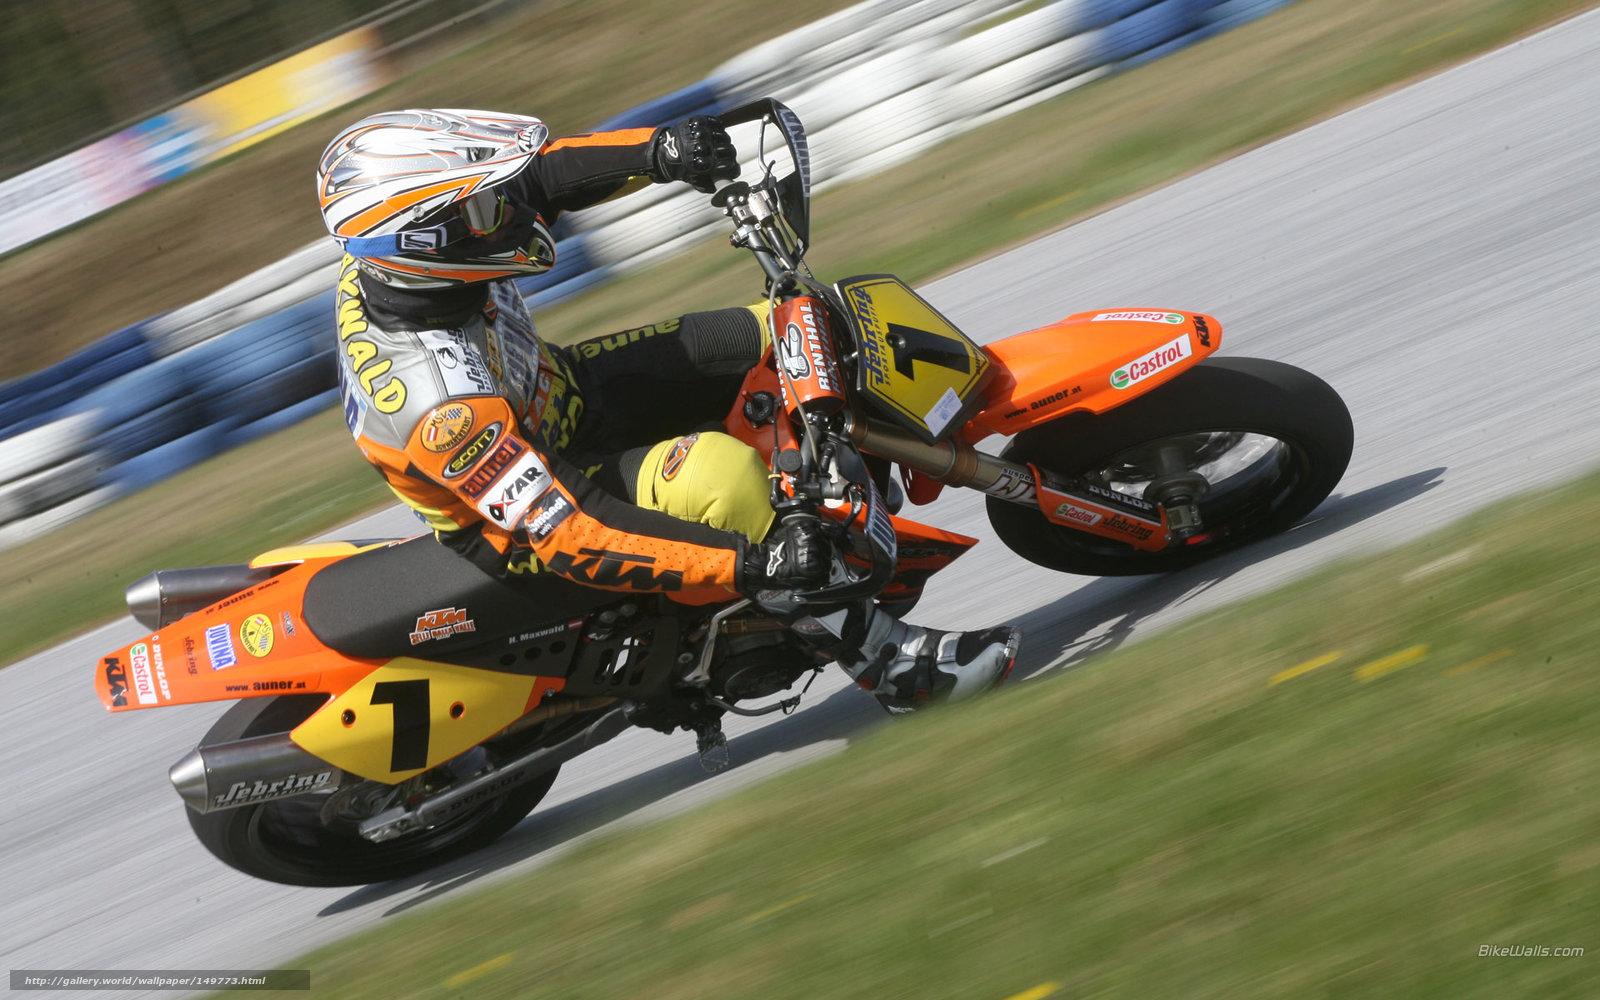 KTM Team Supermoto, Desktop wallpapers #39087